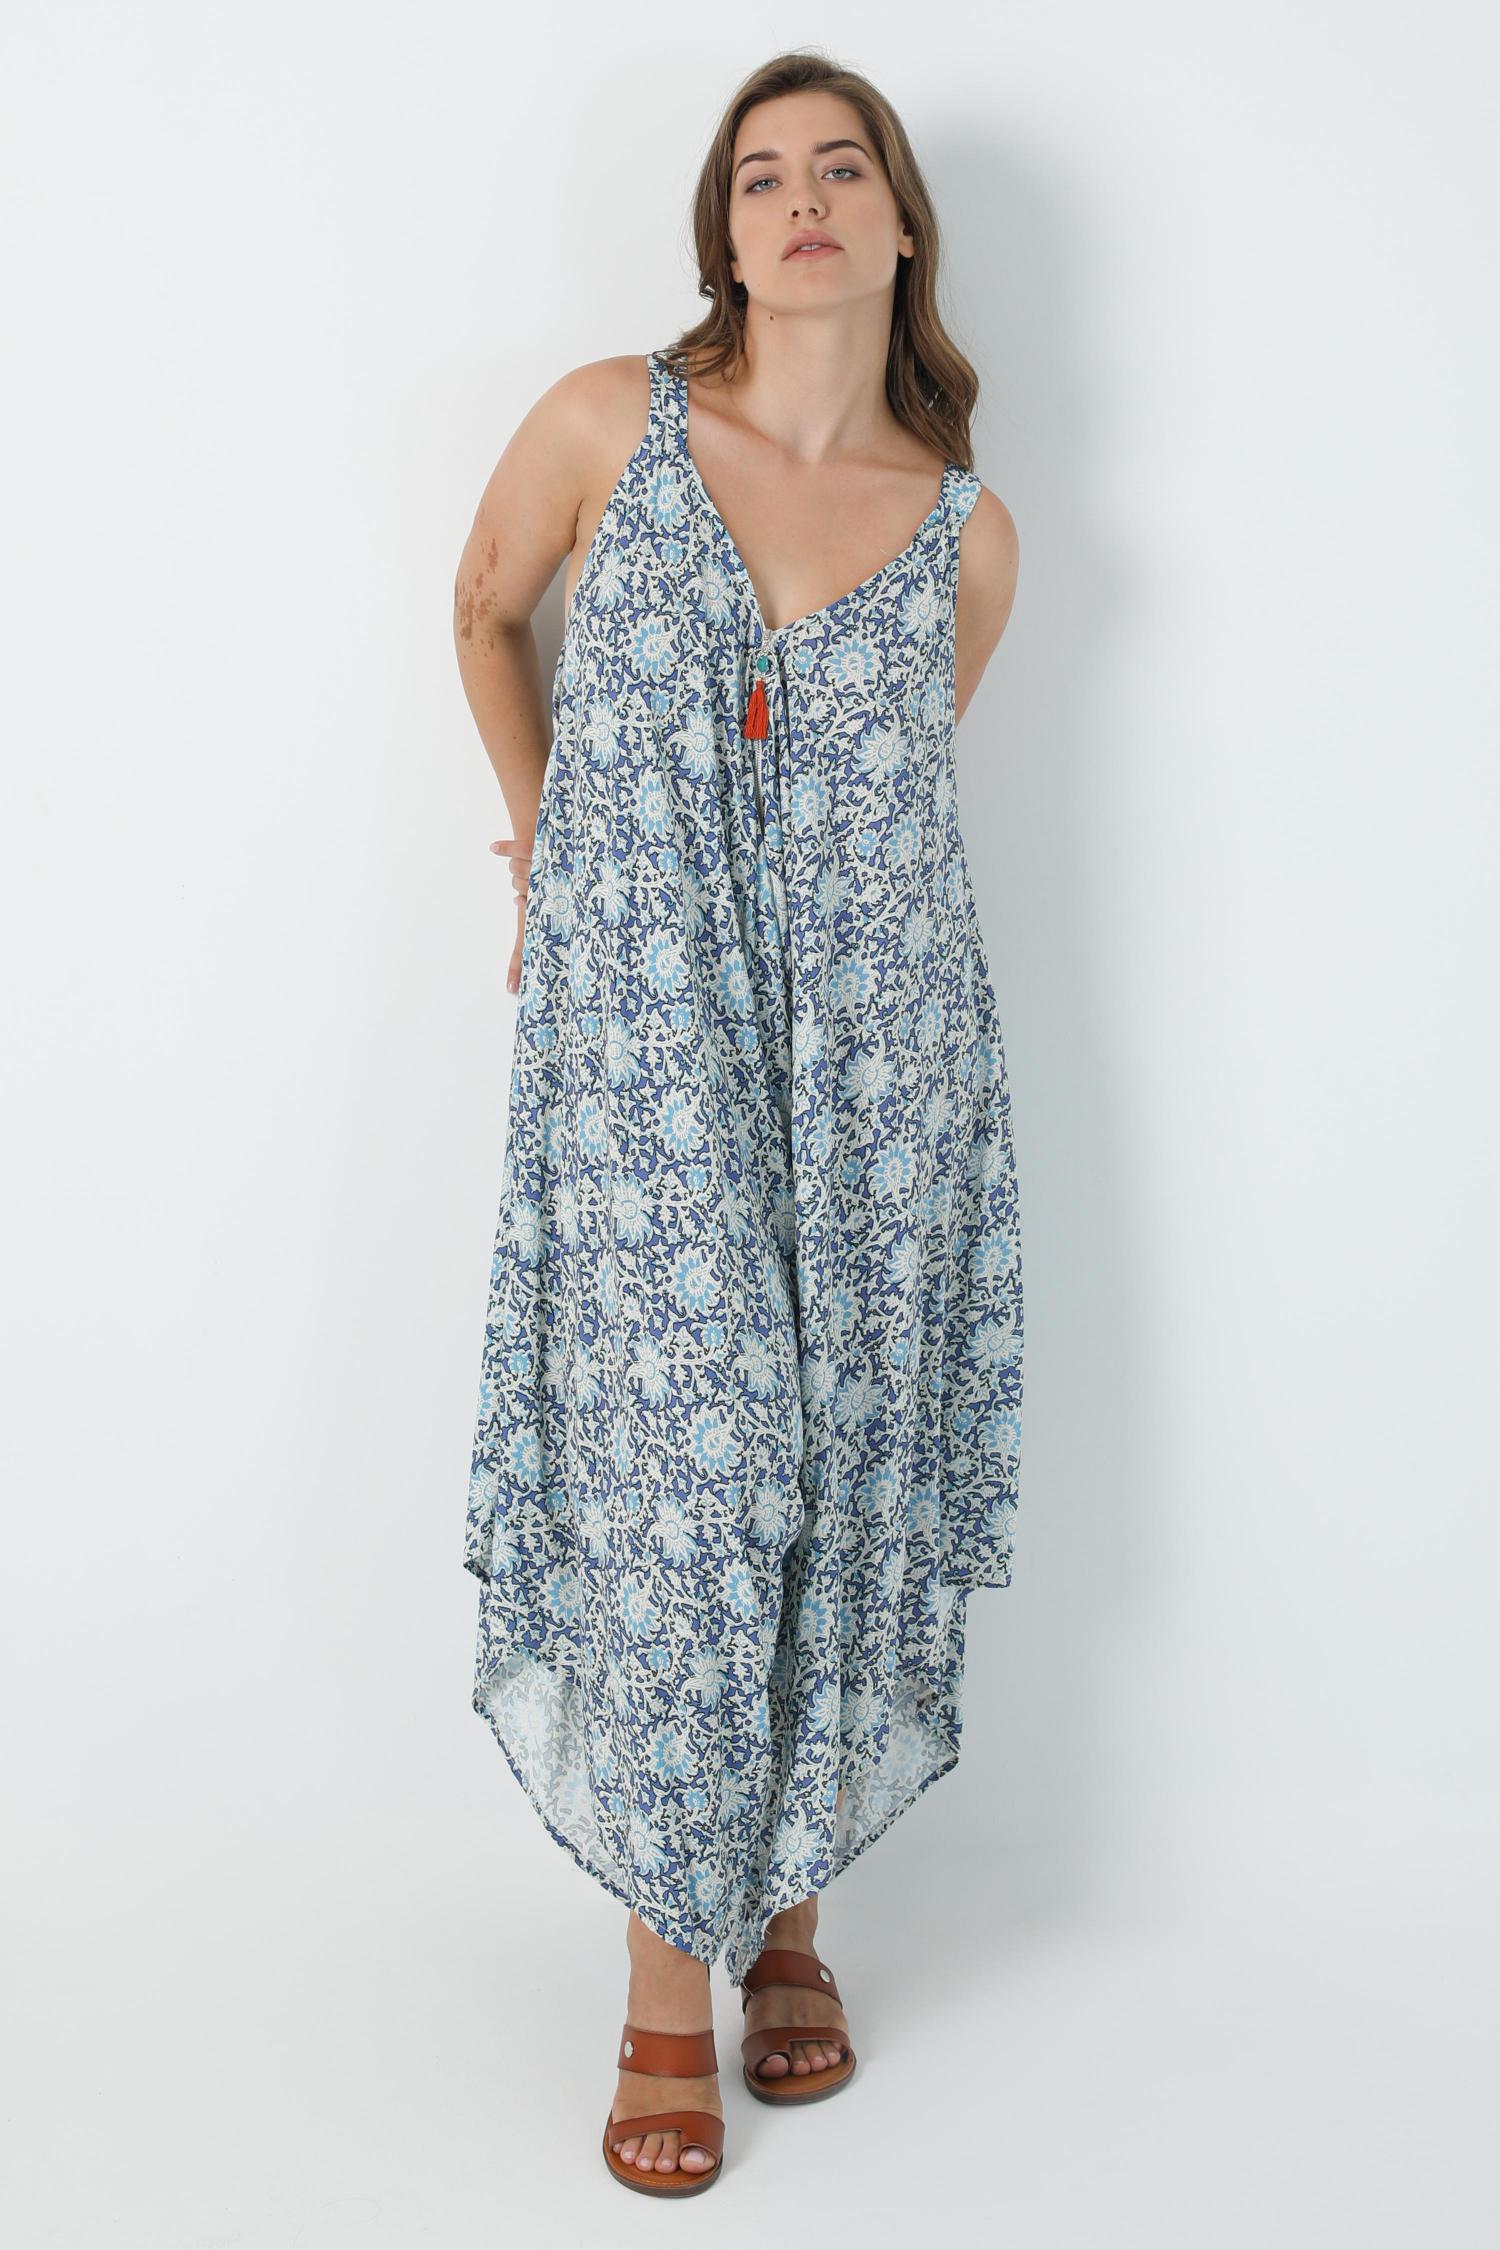 Harem effect printed jumpsuit with oeko-tex fabrics